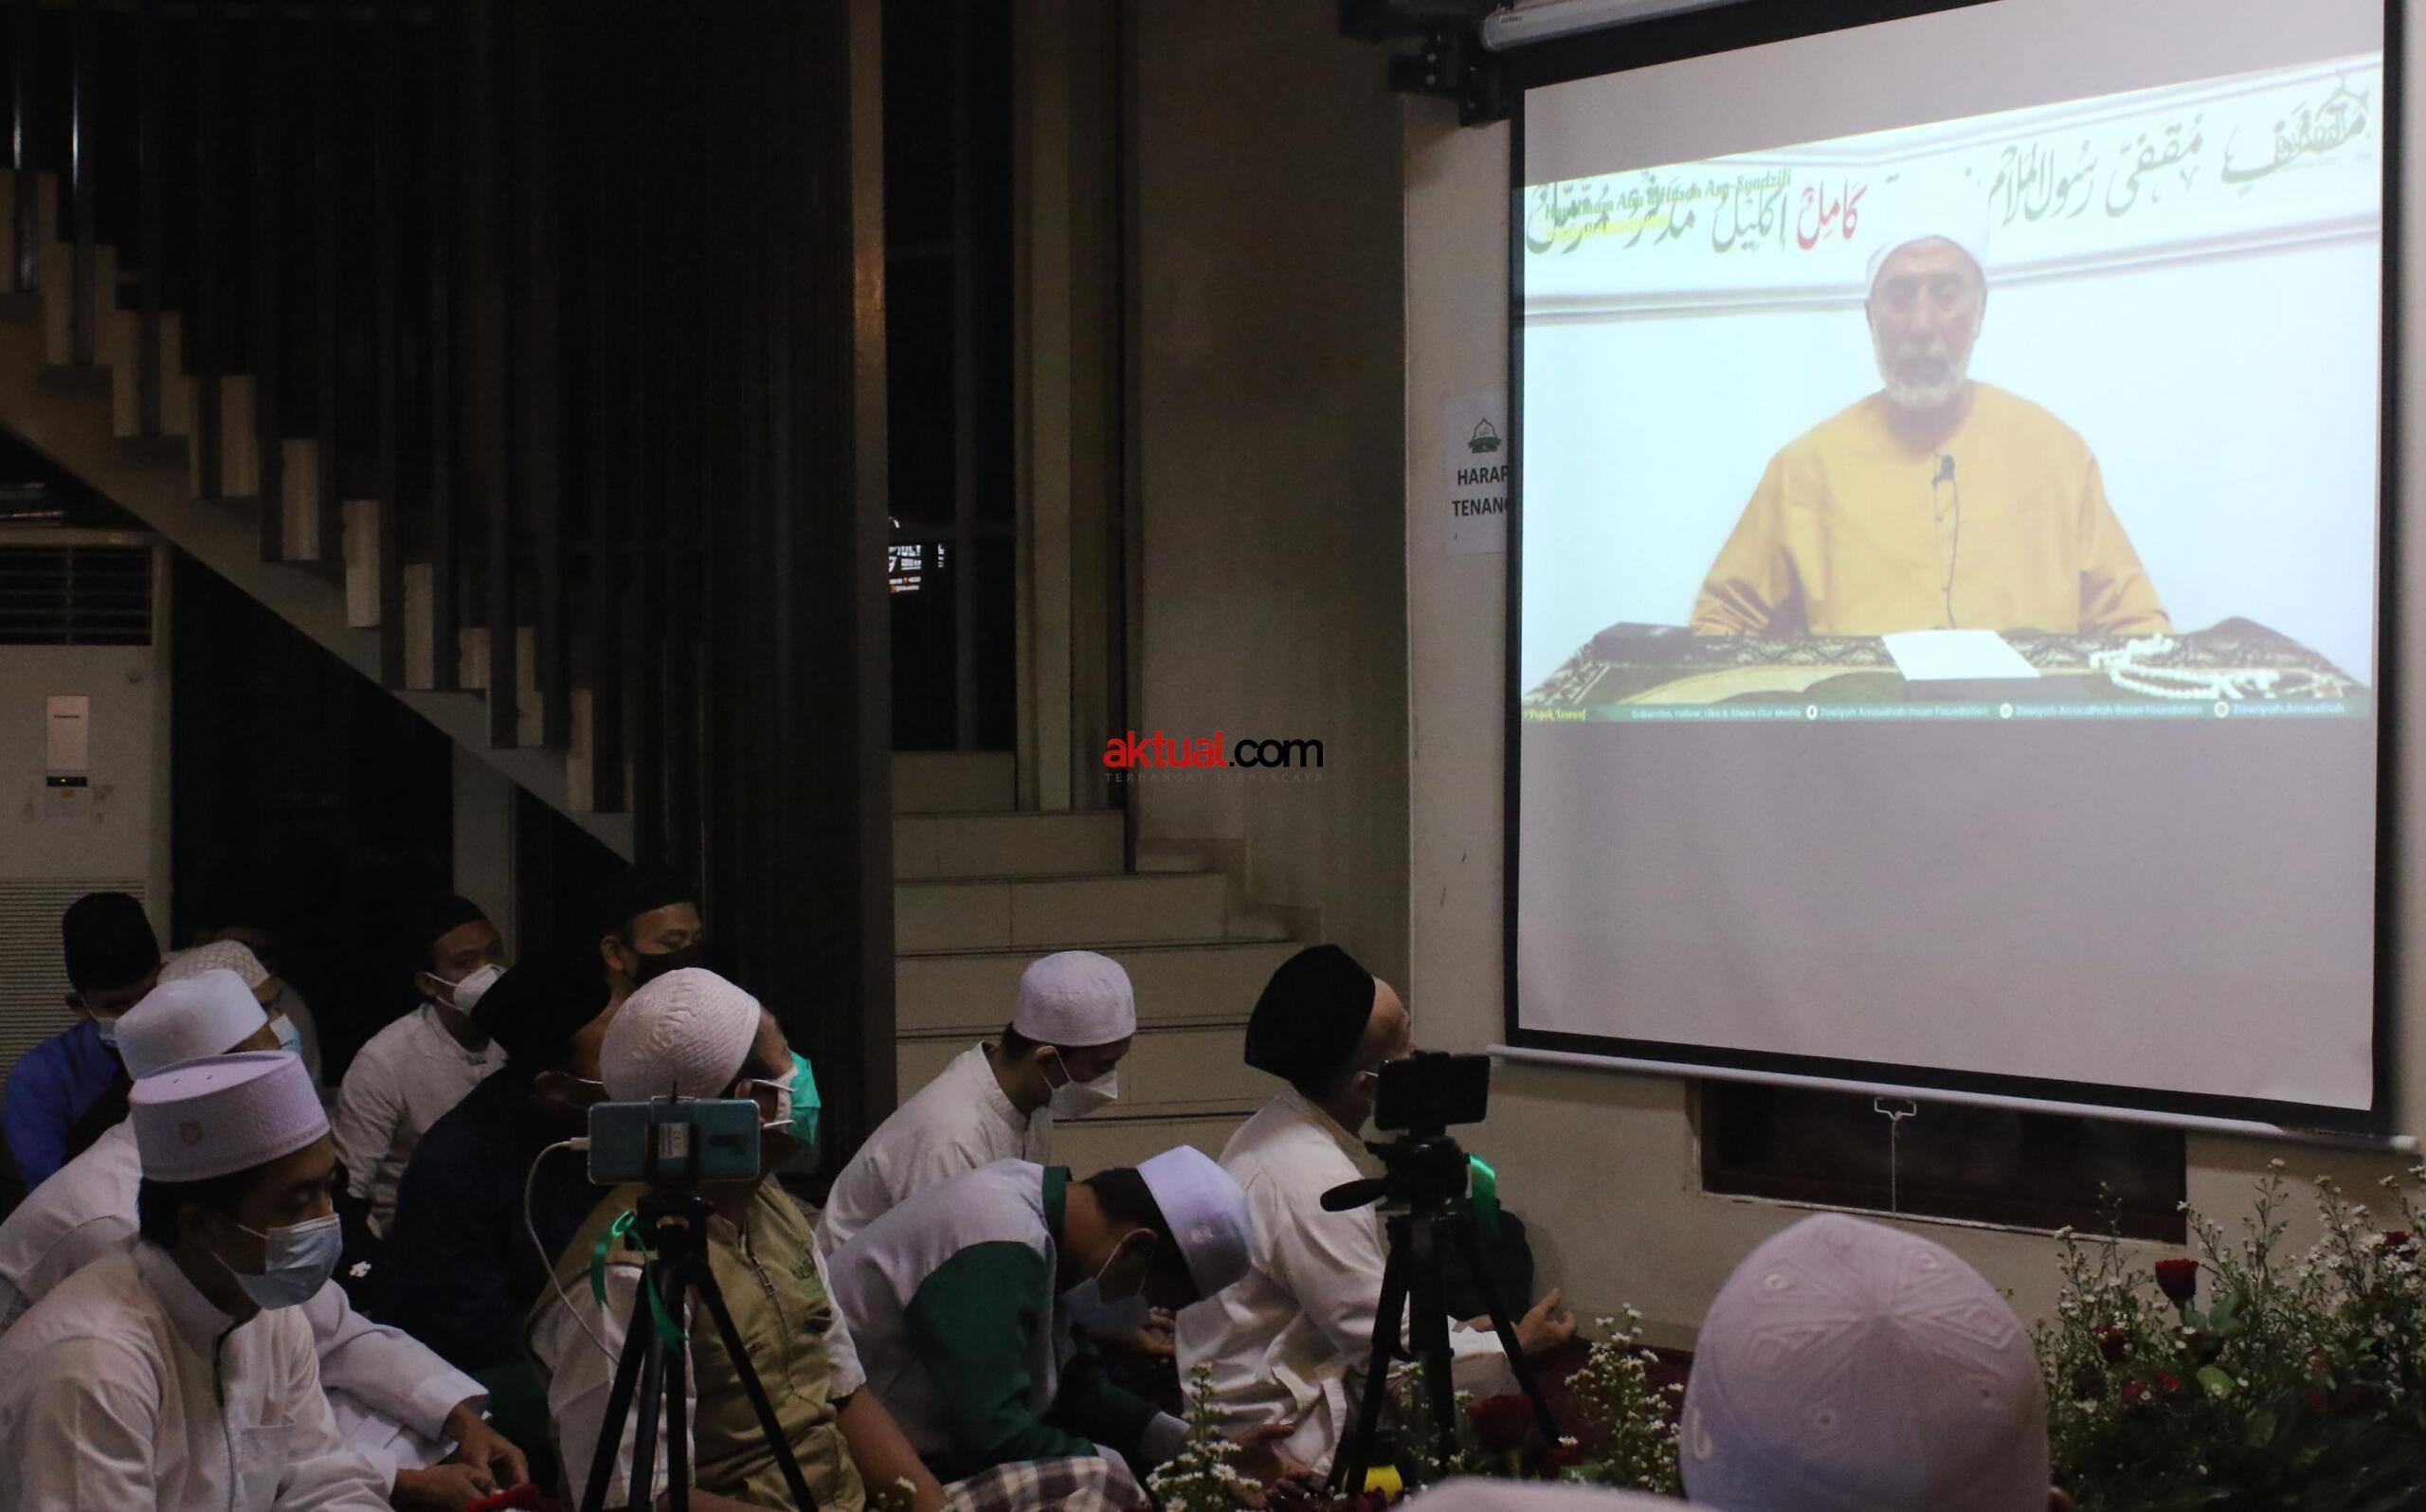 Memperingati Haul Quthbul Aqthab wa Kahfu Amnith Thullab Al-Imam As-Sayyid Syekh Abu alHasan Ali Asy-Syadzili RodhiyaAllahu Anhu Ke-786, yang digelar secara virtual, Sabtu (26/6). Meningkatnya kurva Covid-19 disejumlah wilayah di Indonesia, menjadi alasan utama Zawiyah Arraudhah Ihsan Foundation sebagai penyelenggara membatasi jamaah yang hadir. Penerapan standar protokol kesehatan (protkes) juga menjadi kewajiban yang harus dilakukan bagi ikhwah toriqoh yang hadir.